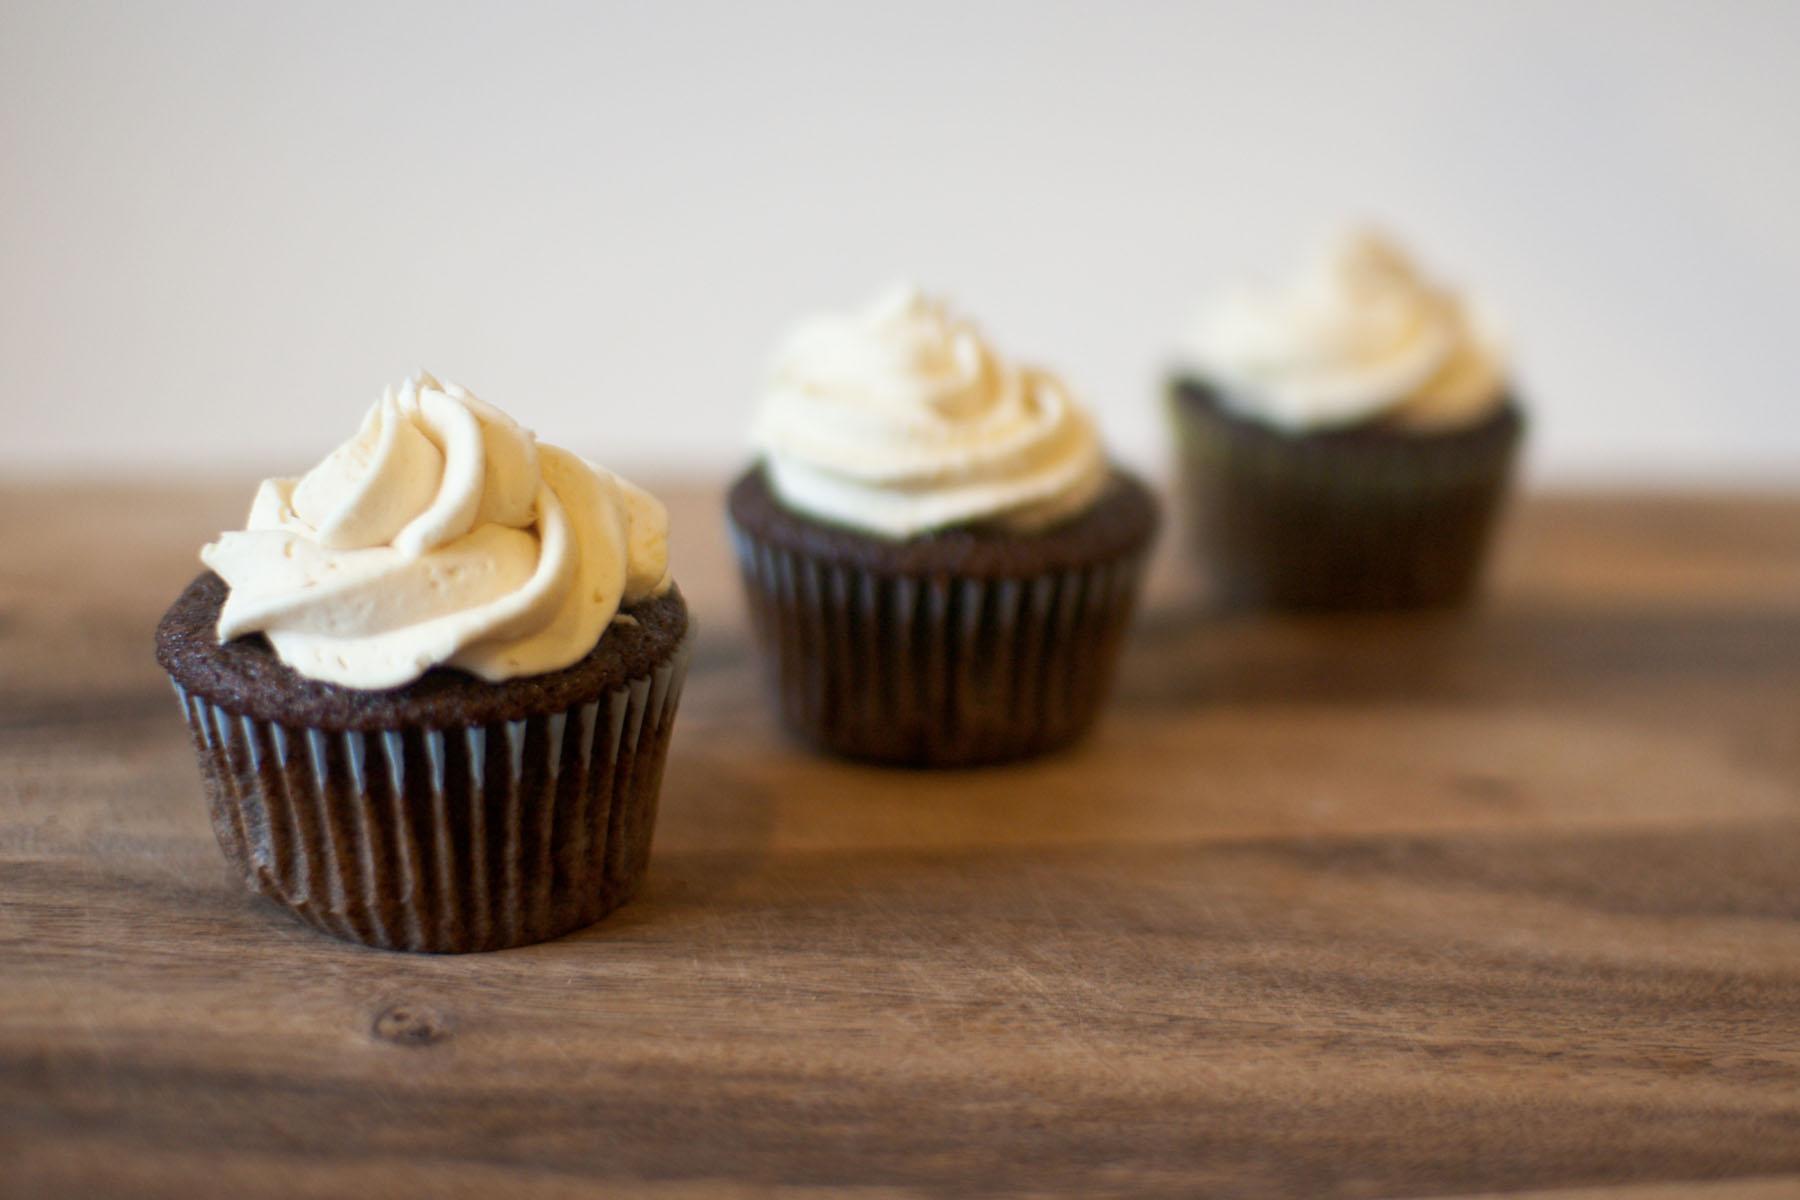 Chocolate Stout Cupcakes With Vanilla Stout Buttercream